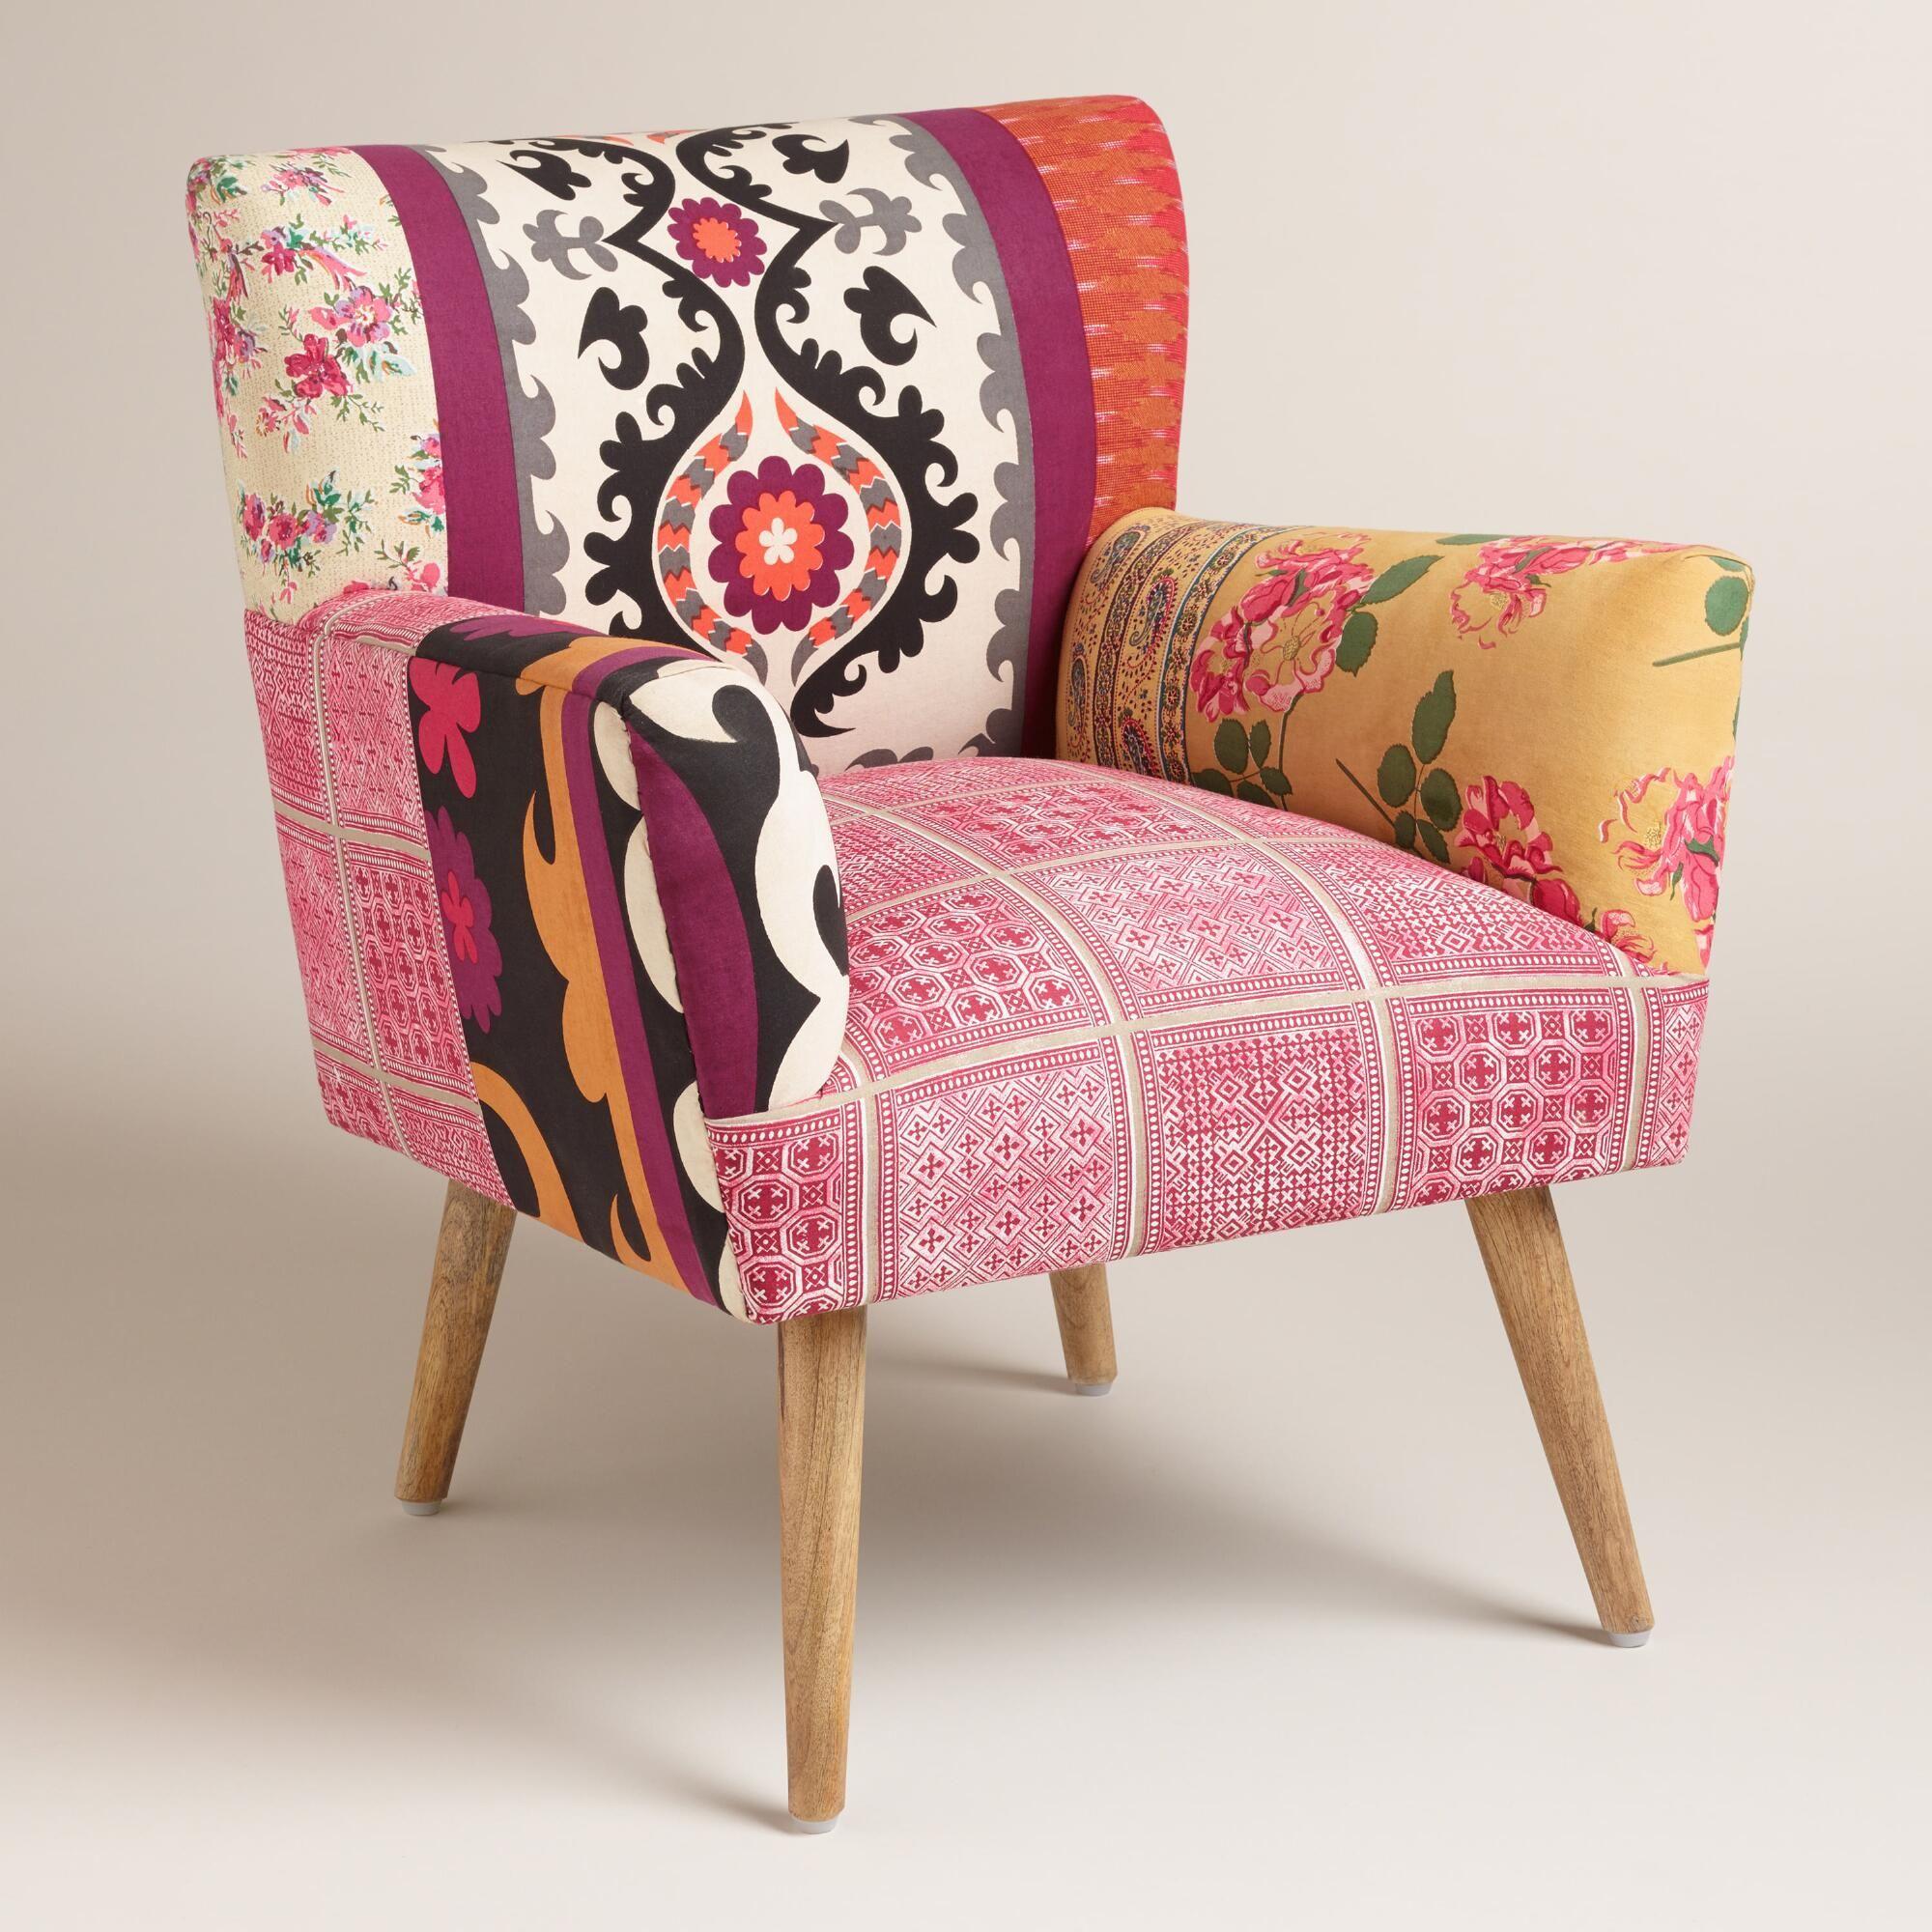 Mixed Print Etta Chair By World Market Cost Plus Boho Chair